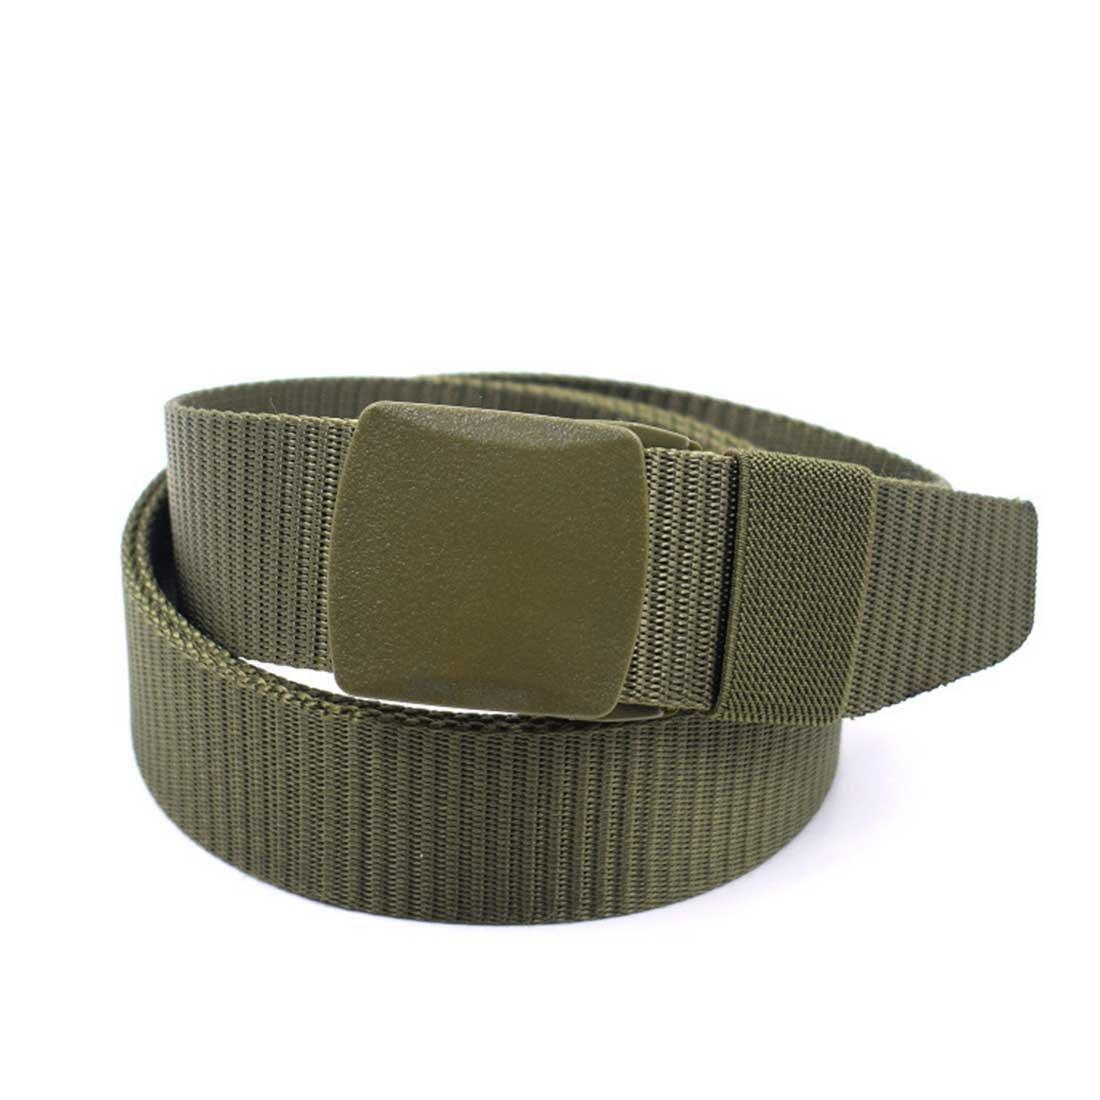 Romanlin Tactical Belt for Men Buckle Strengthen Nylon Webbing Adjustable for Outdoor